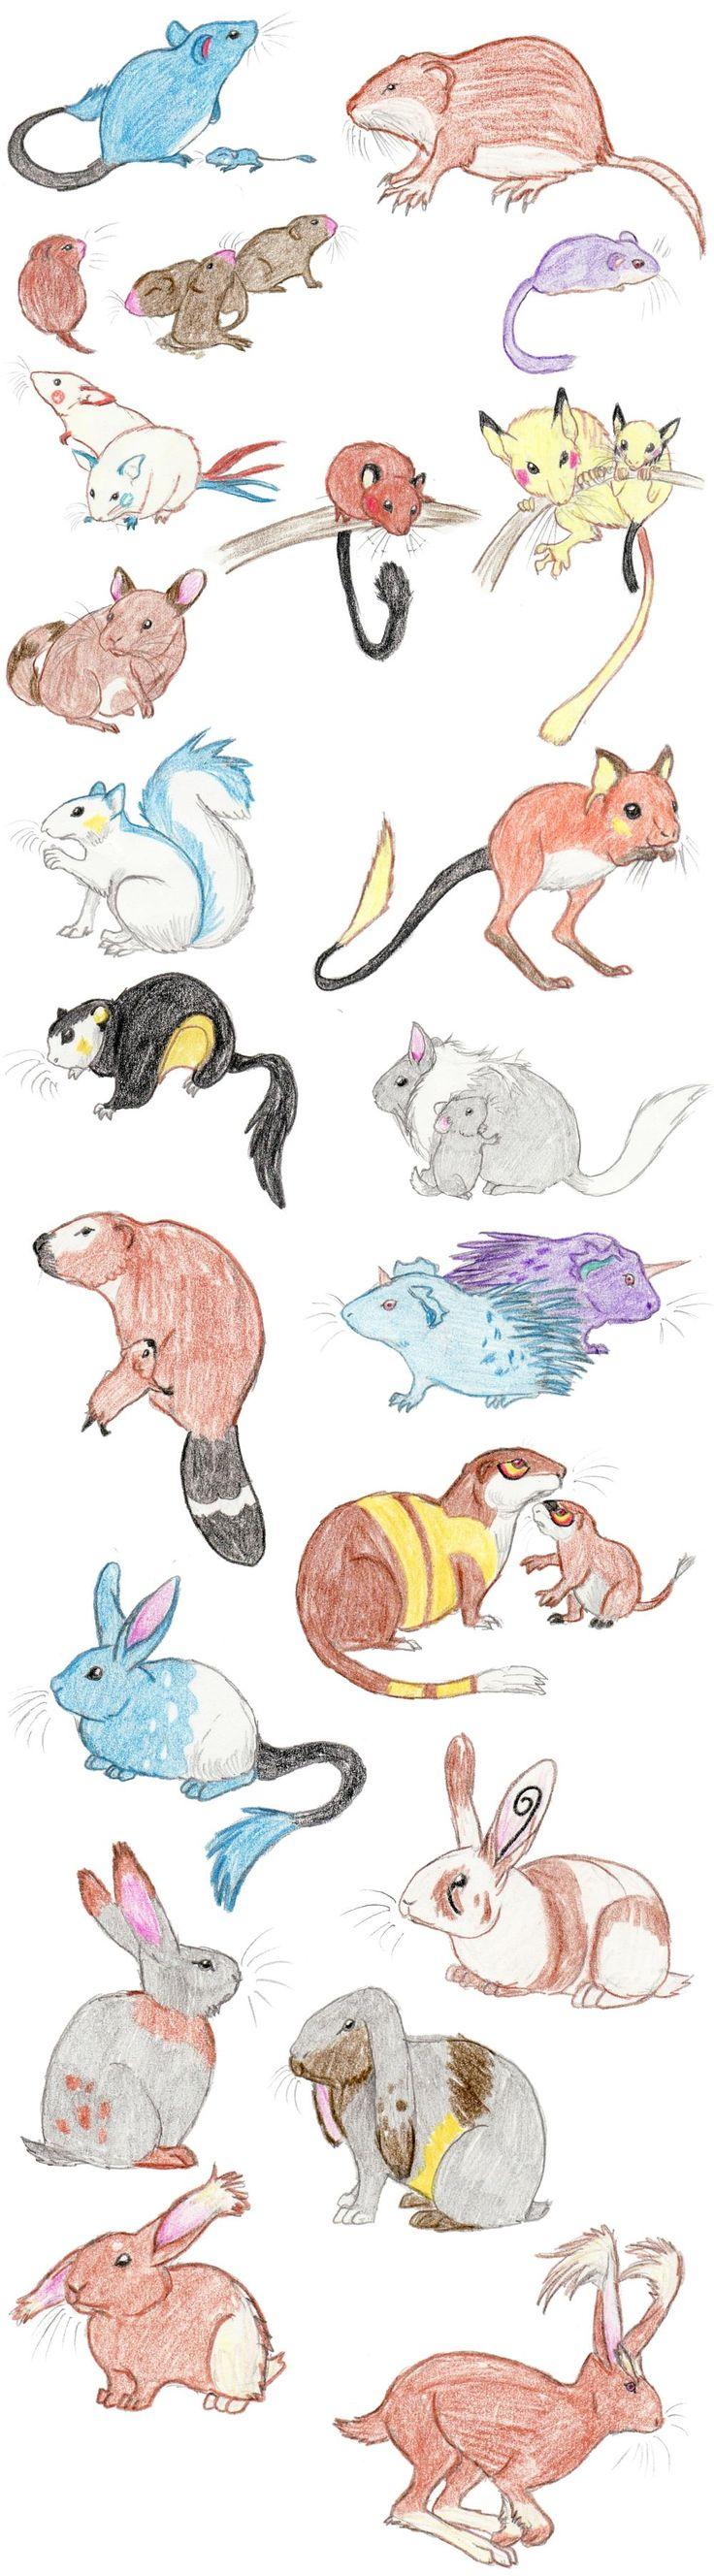 Rodent Pokemon by DragonlordRynn on deviantART